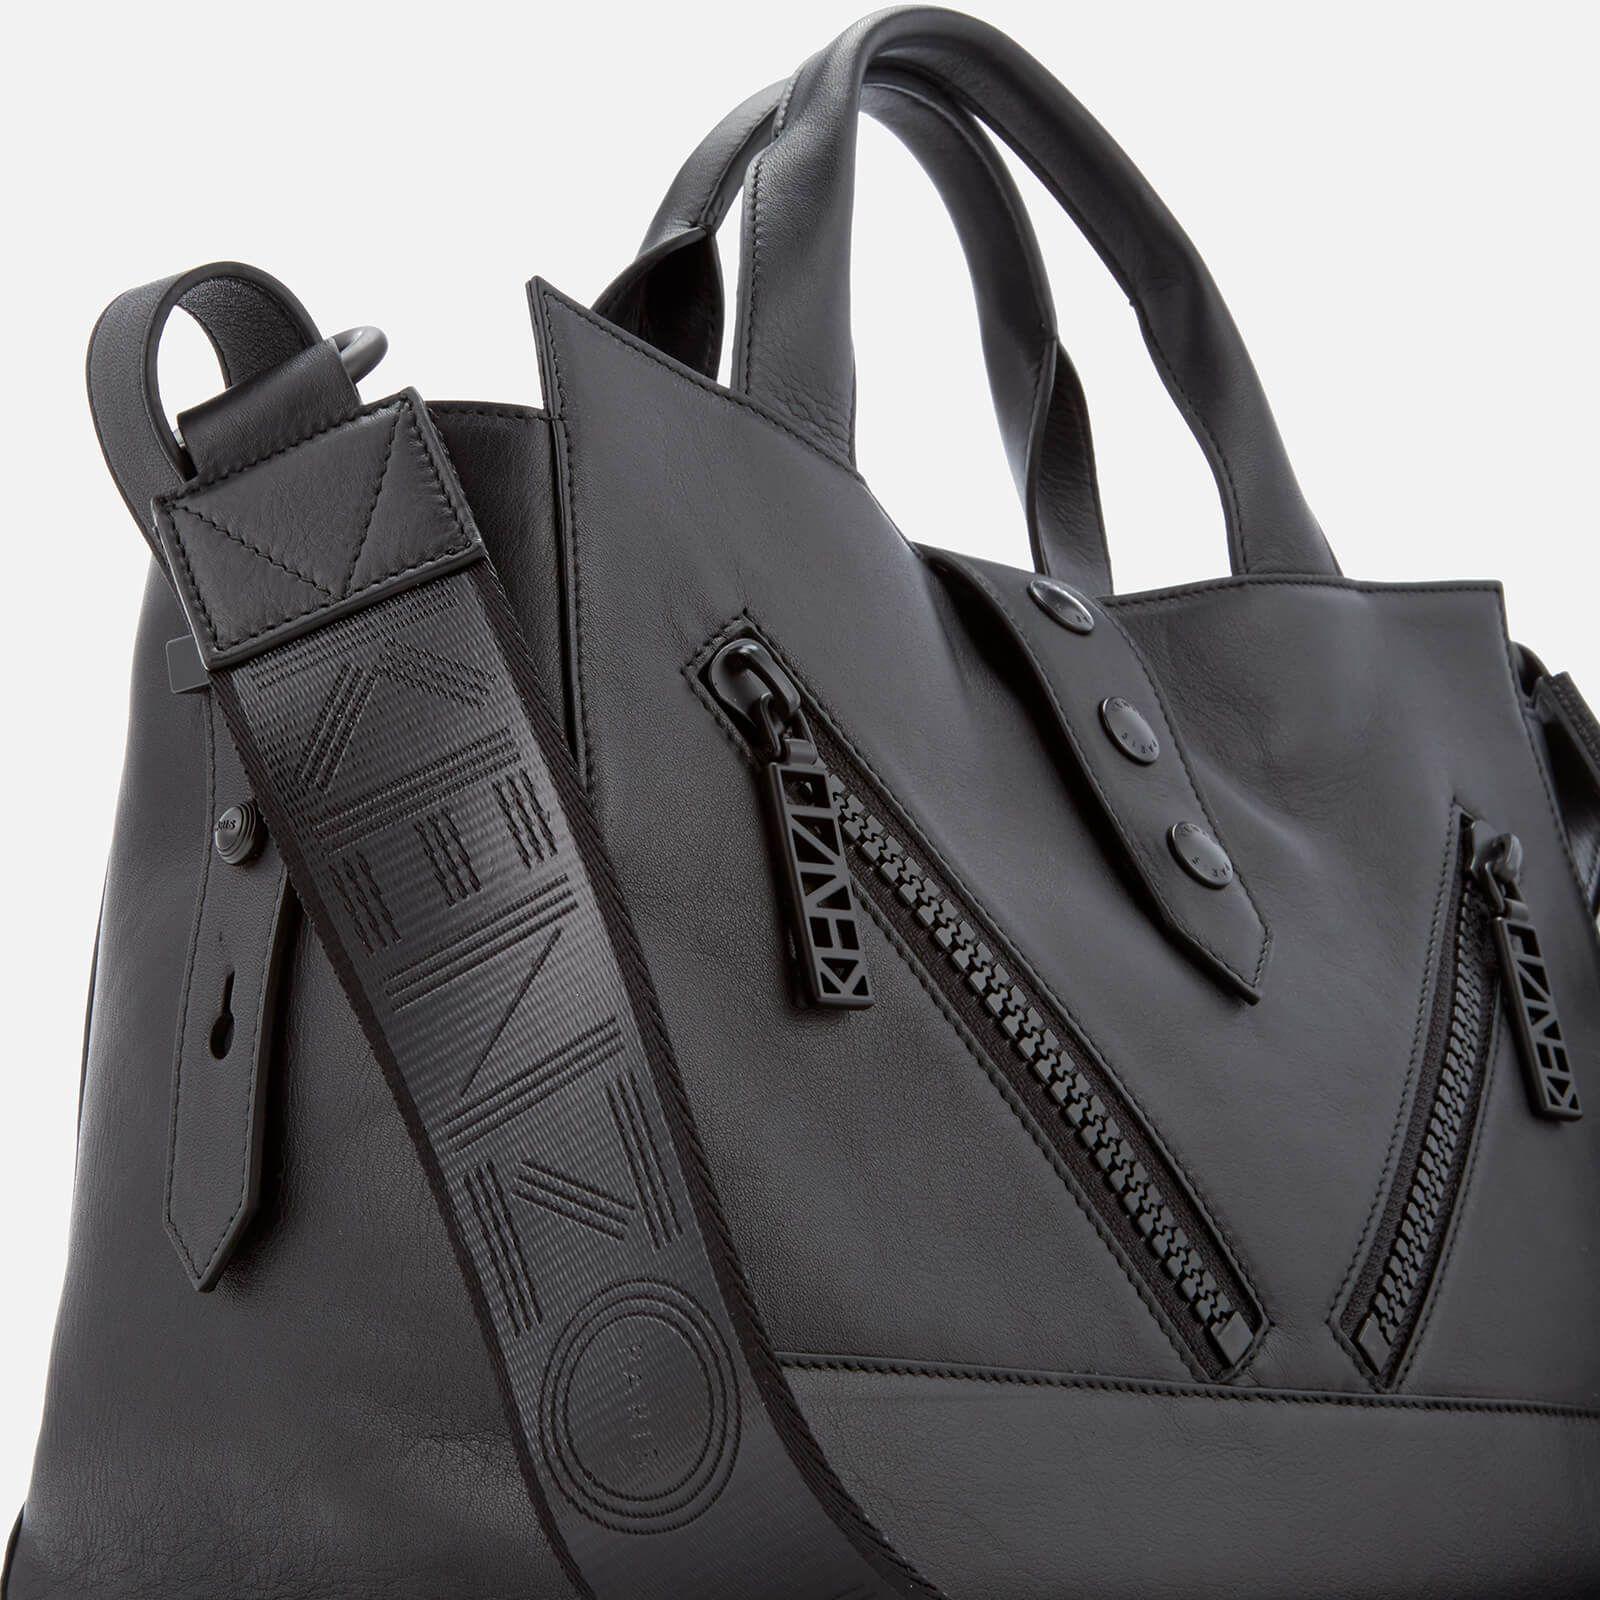 a5163e42 KENZO Women's Sport Medium Kalifornia Tote Bag - Black | ST. | Black ...